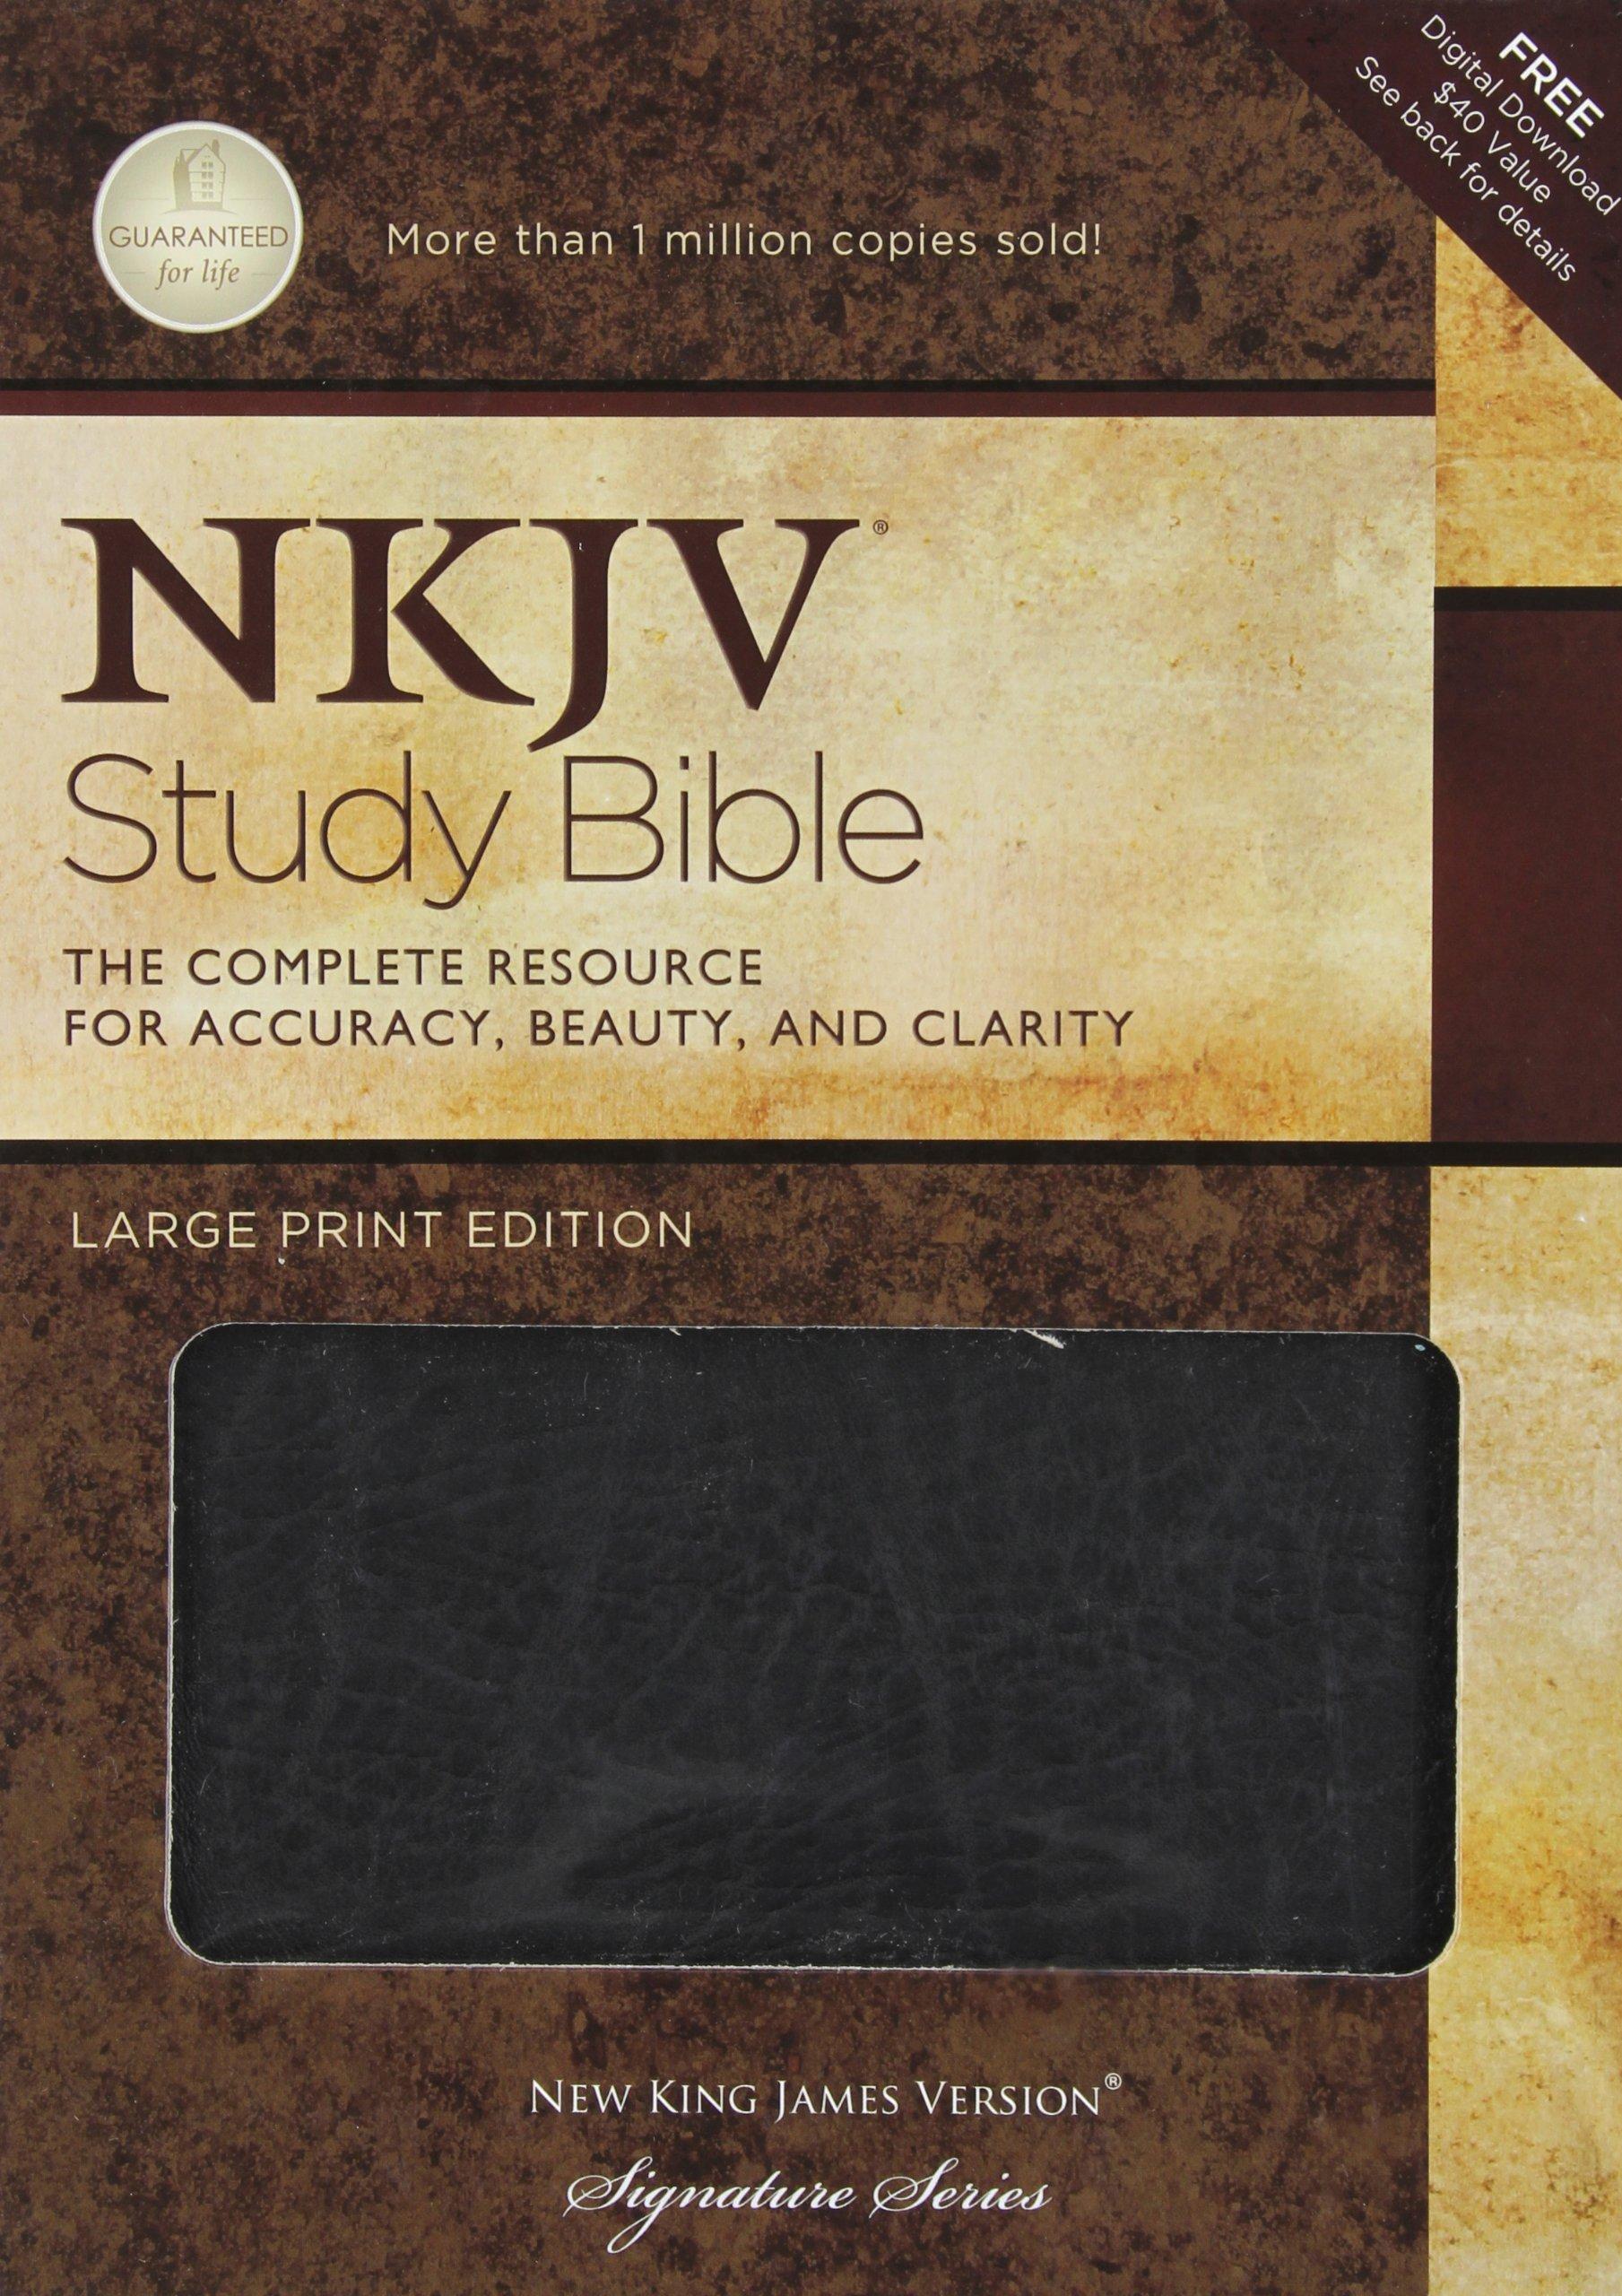 NKJV Study Bible, Large Print, Bonded Leather, Black: Large Print Edition